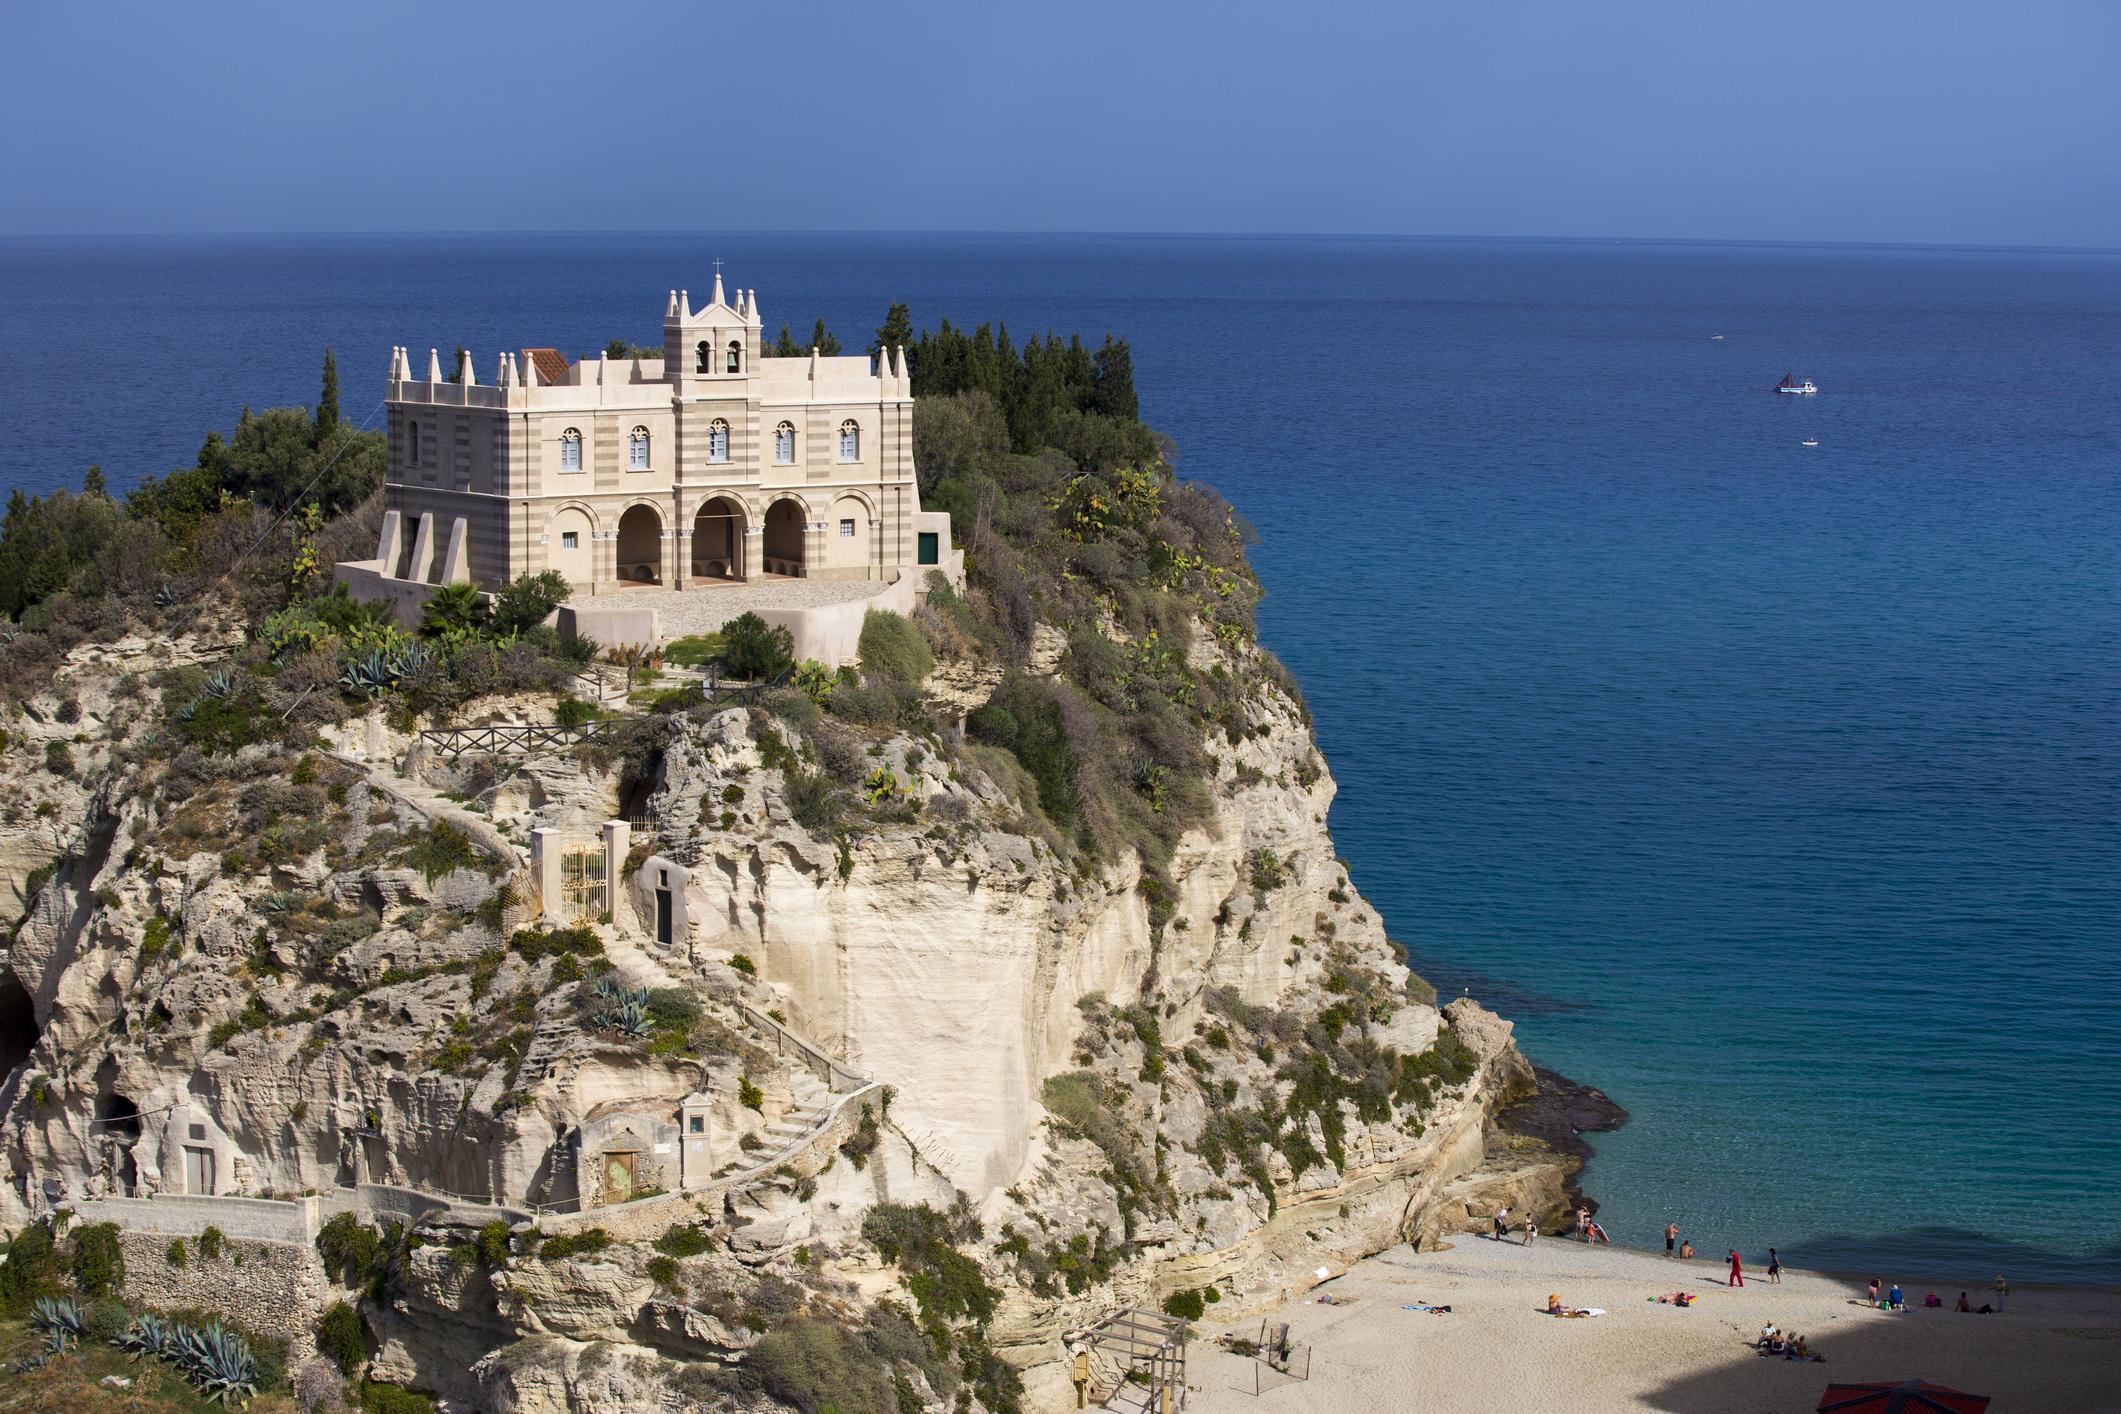 Church Chiesa Santa Maria dell'Isola, Tropea, Calabria,